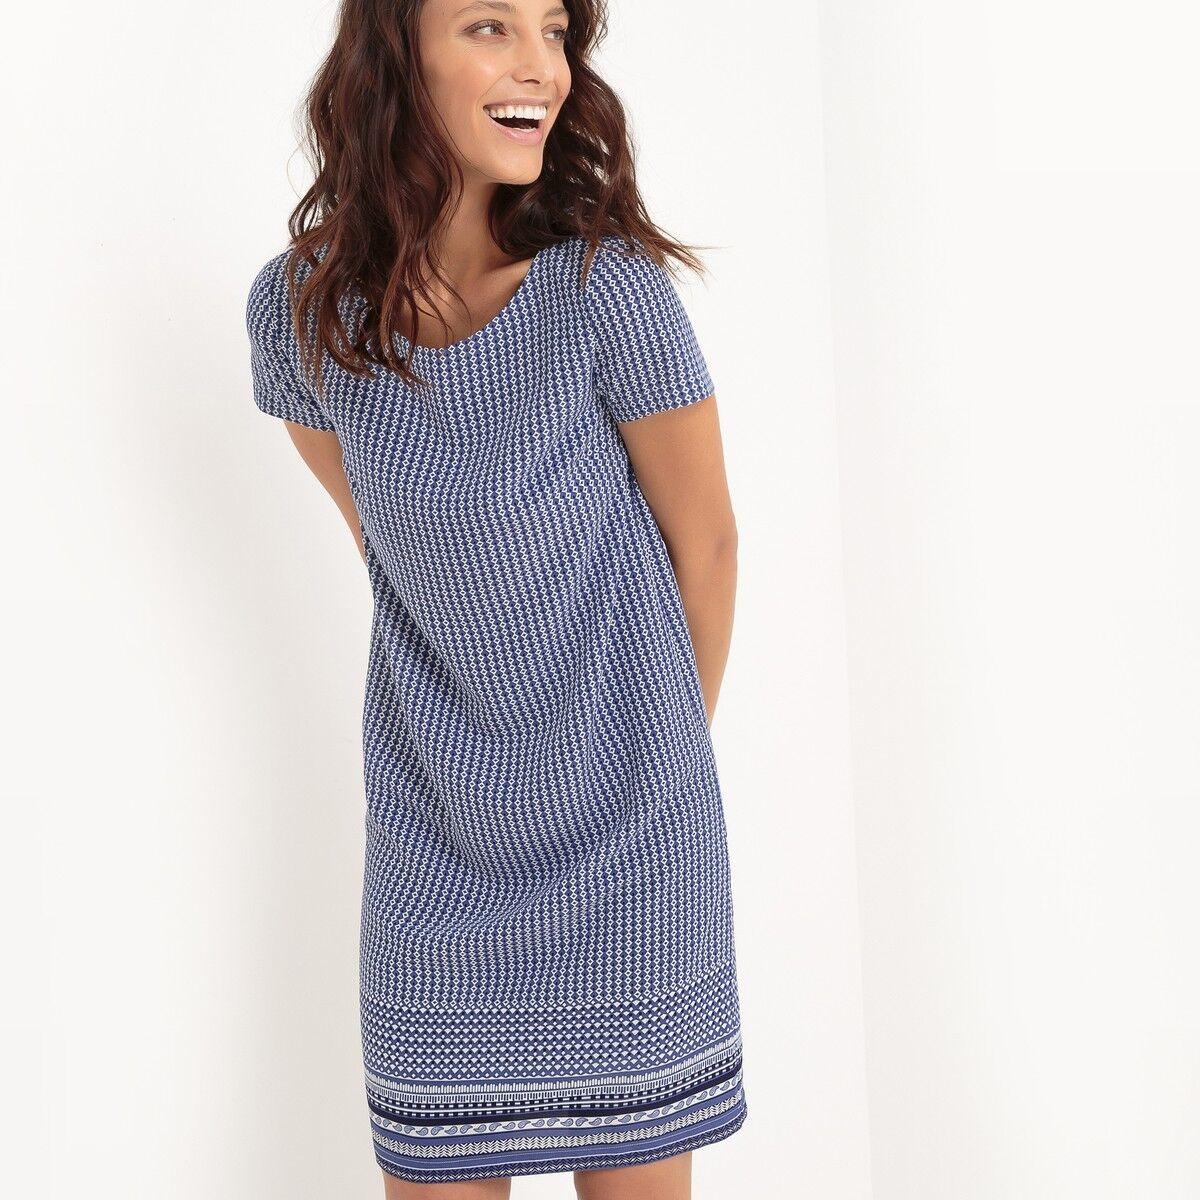 La Redoute Atelier R Mix Print Short Shift Dress Size 22 BNWT RRP .99 bluee